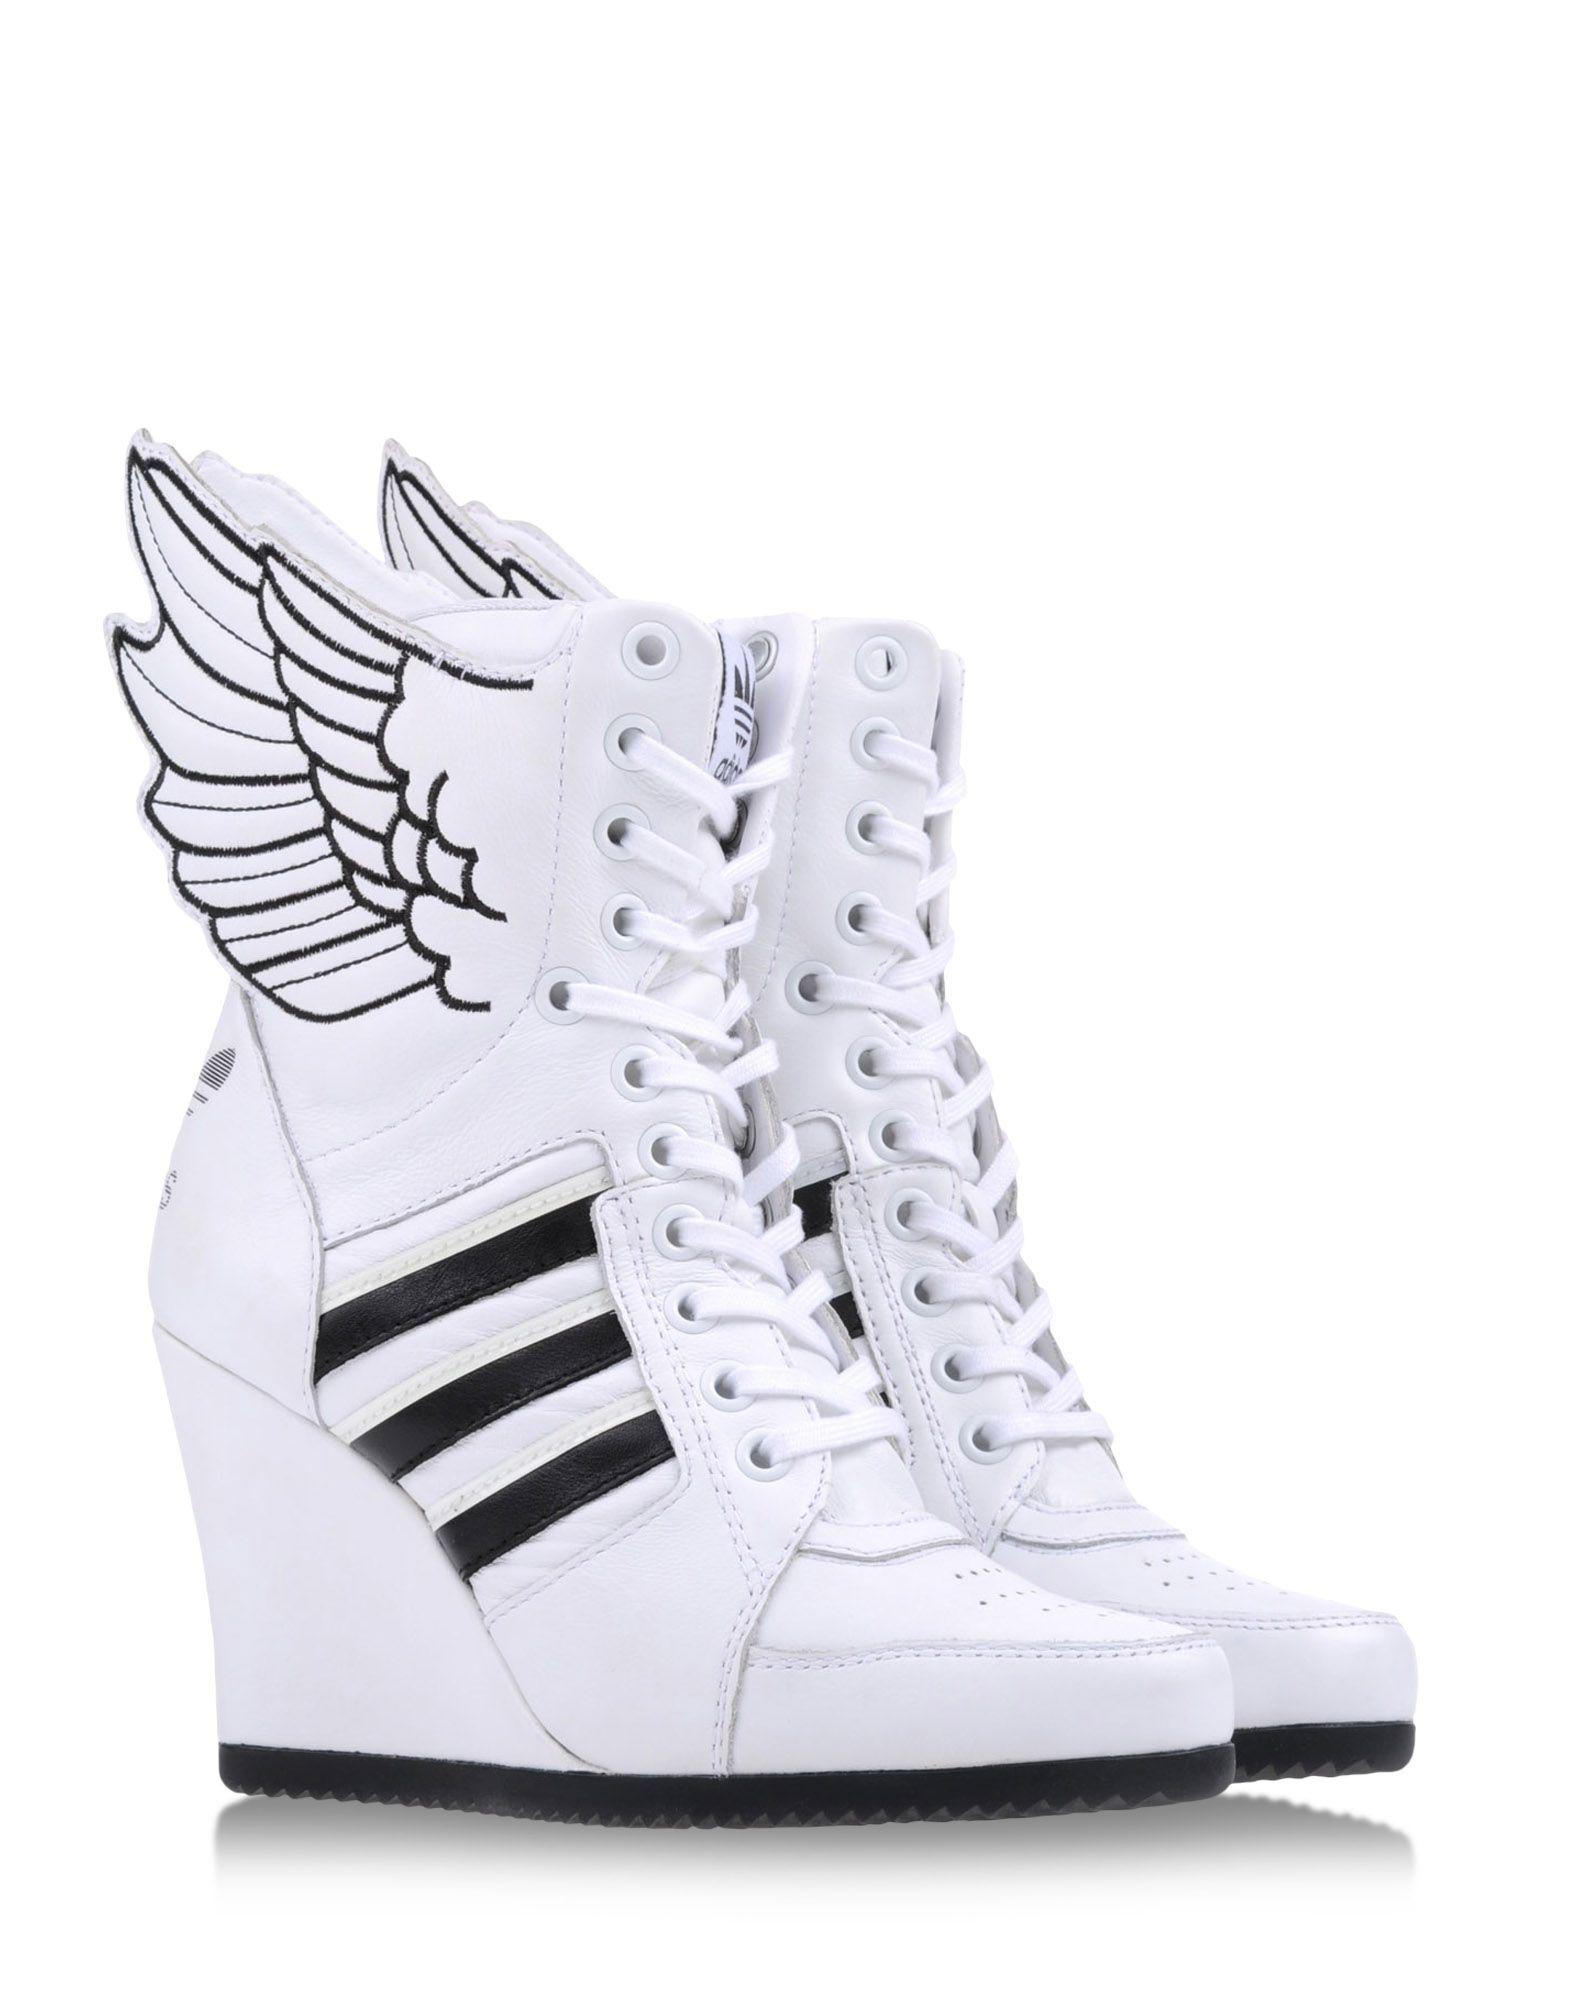 3a51a2f0a2fa Adidas by Jeremy Scott High-tops